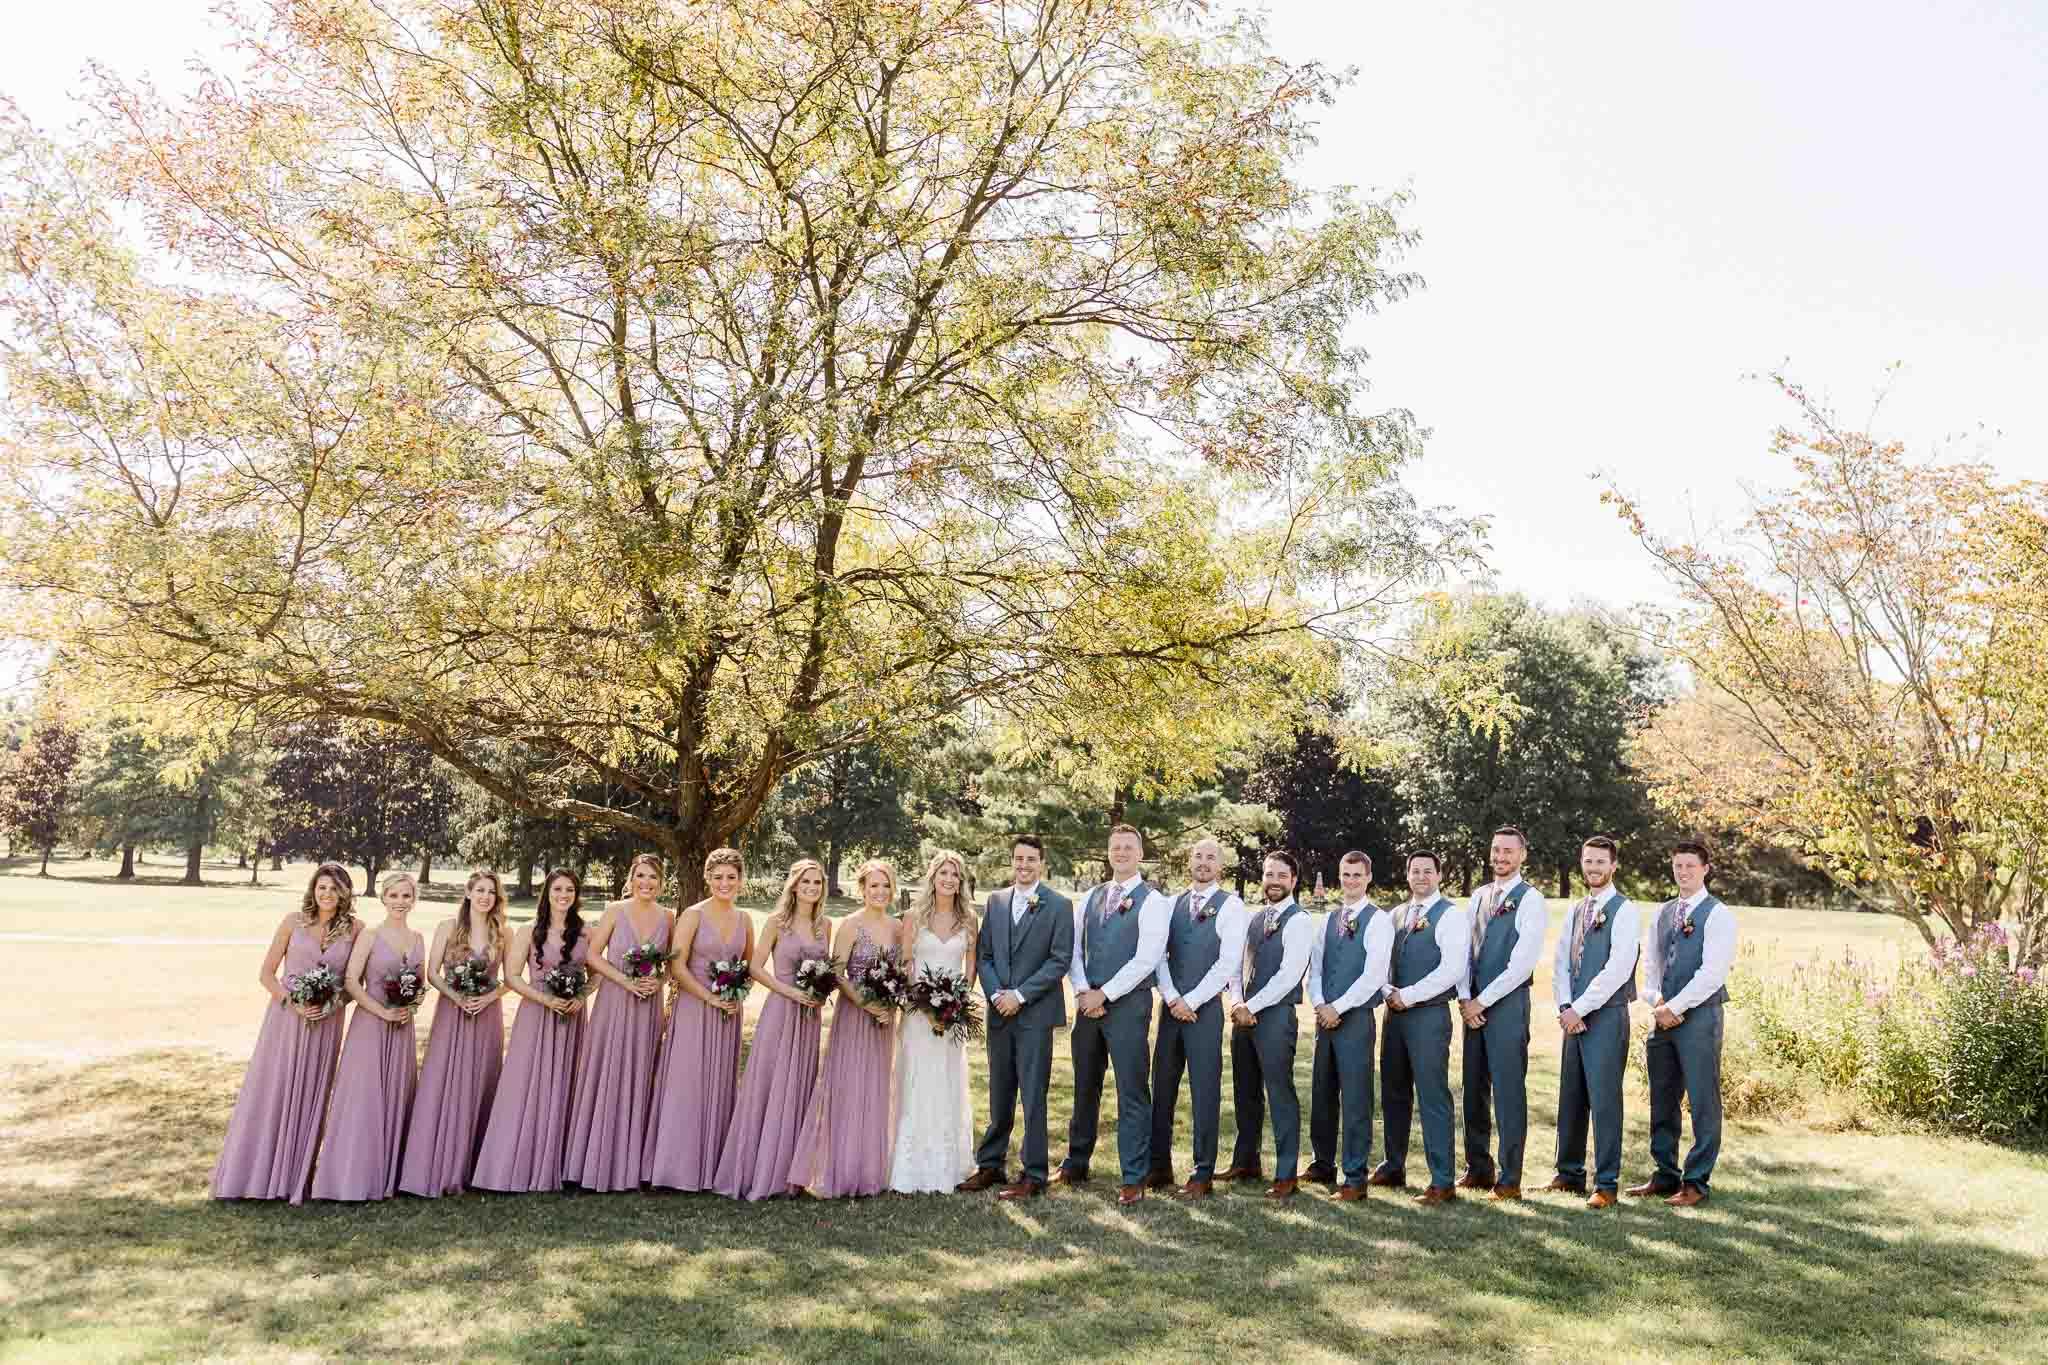 Frosty-Valley-September-Wedding-7399.jpg